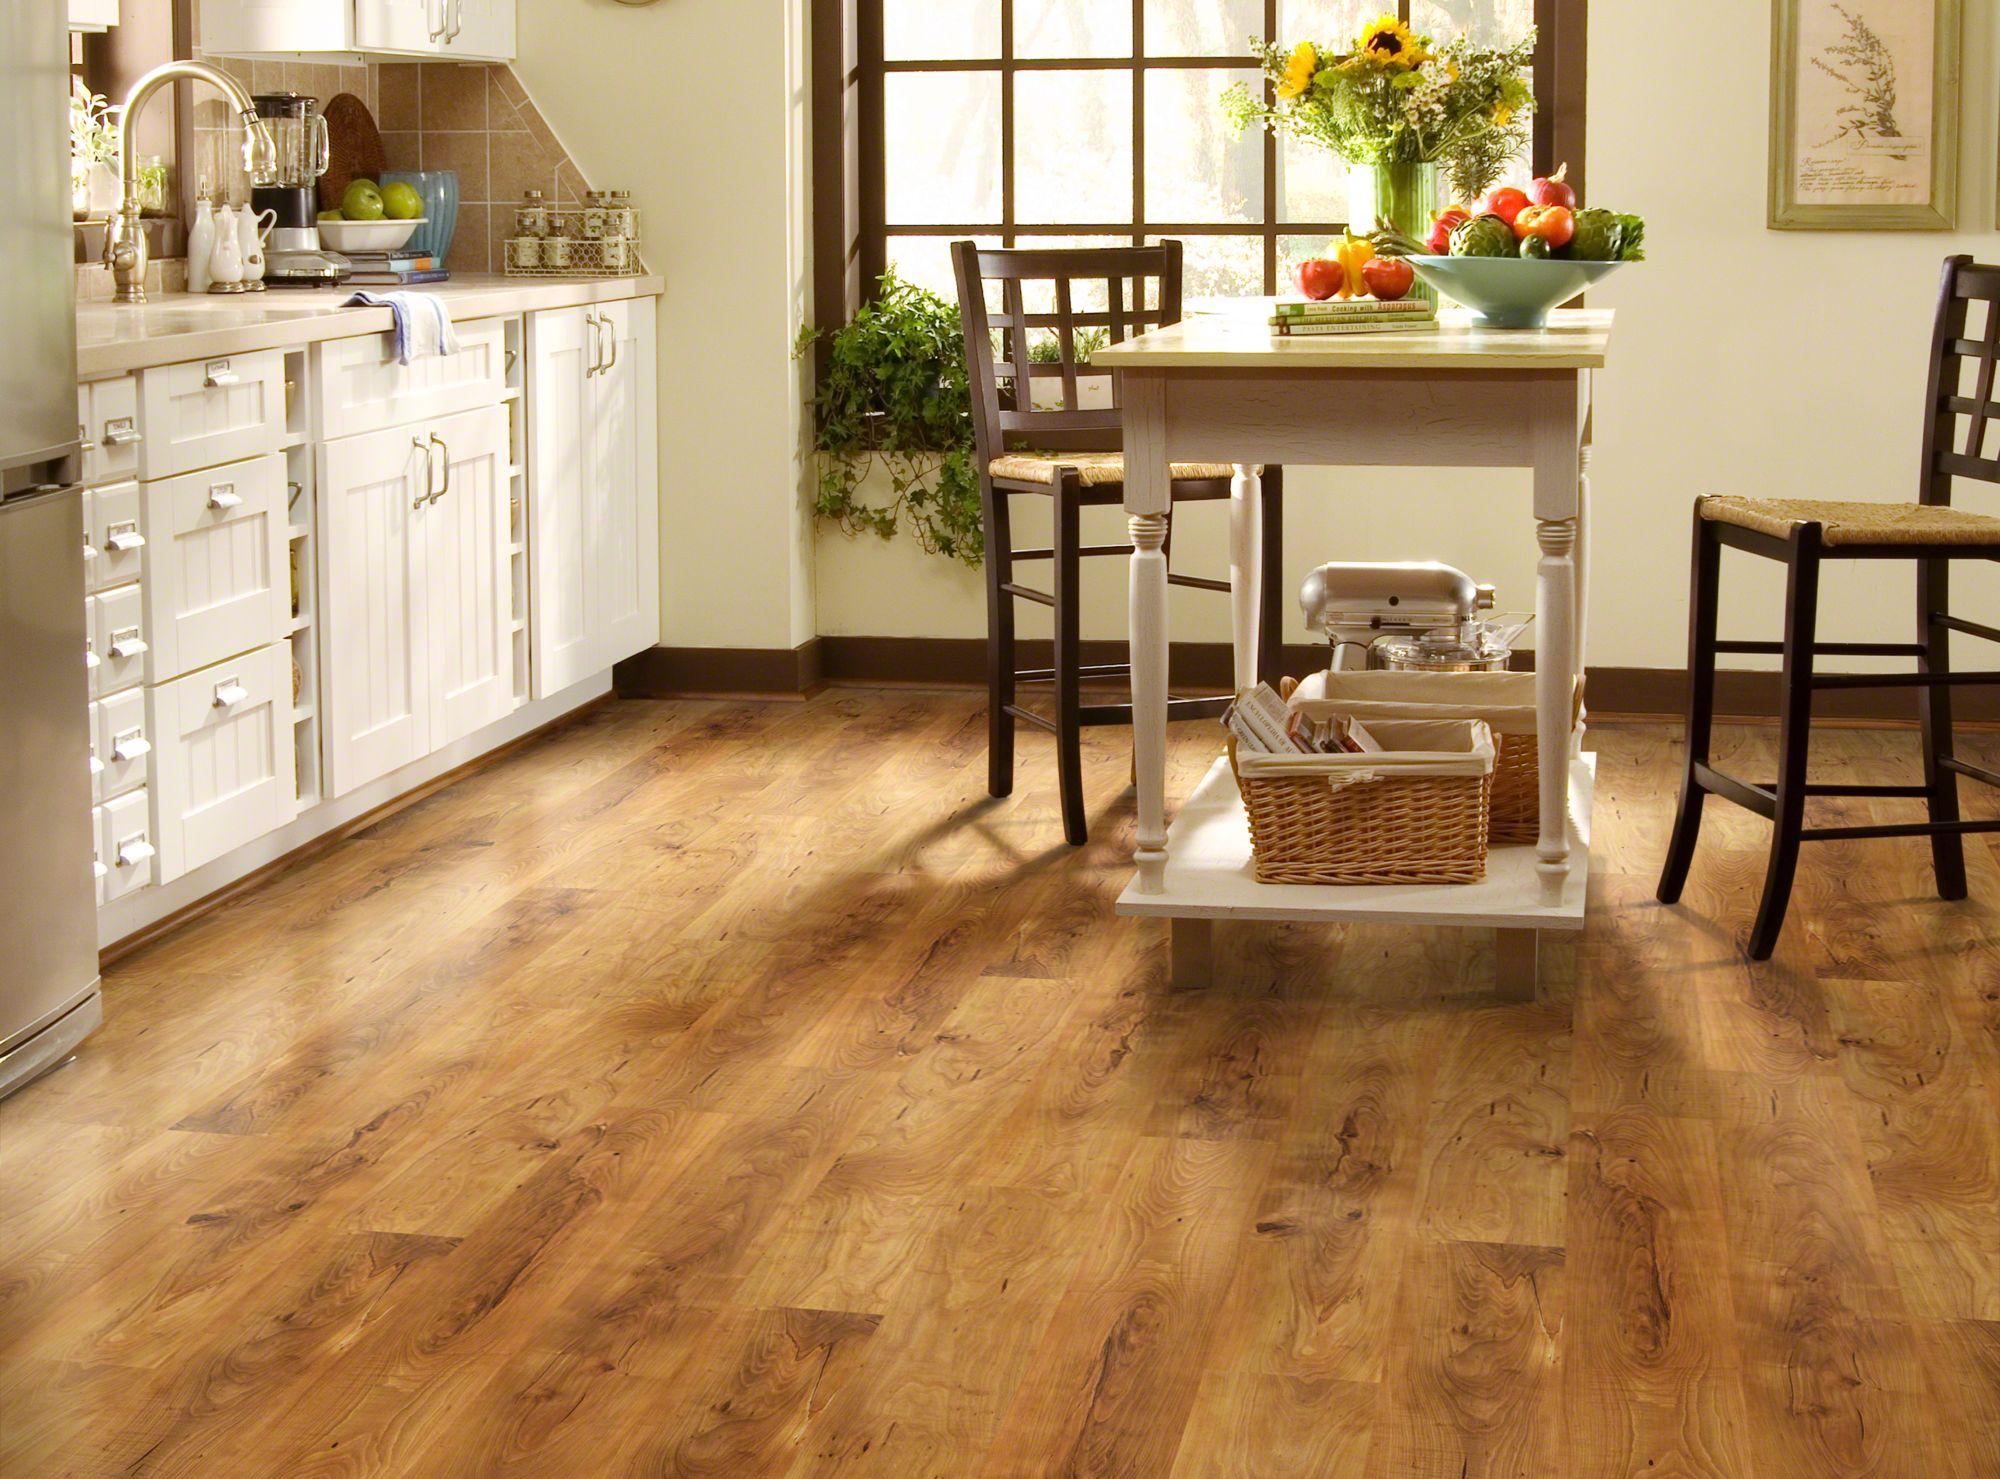 Wooden beauty: laminate floors